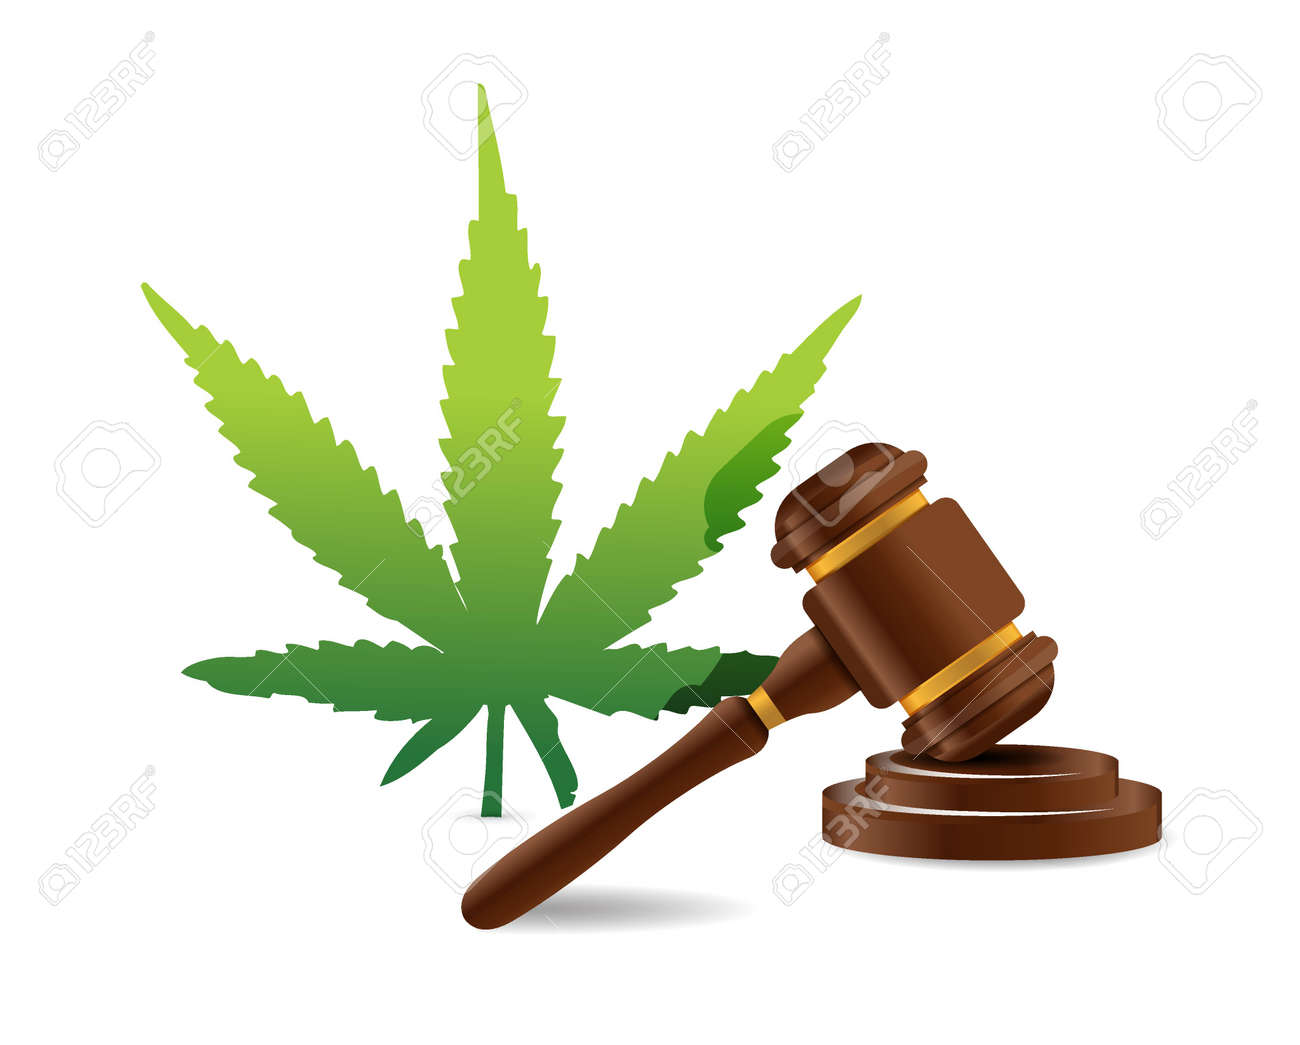 marijuana law hammer illustration design graphic icon - 46669151